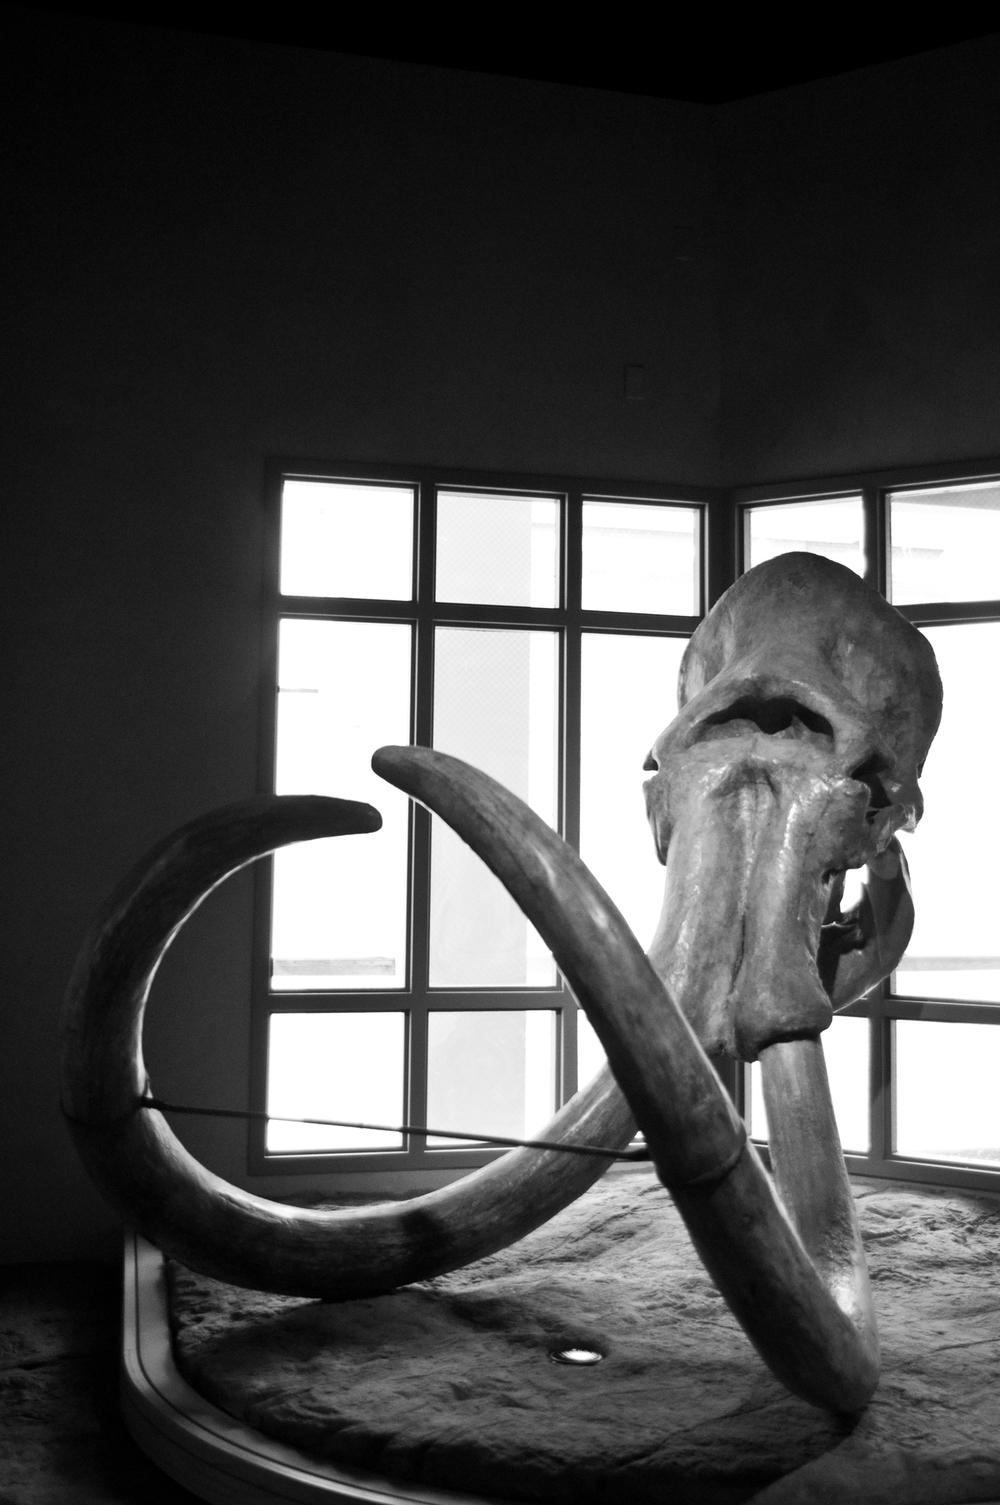 Objects-Fine-Art-Photography-Jay-Lansford-016.jpg